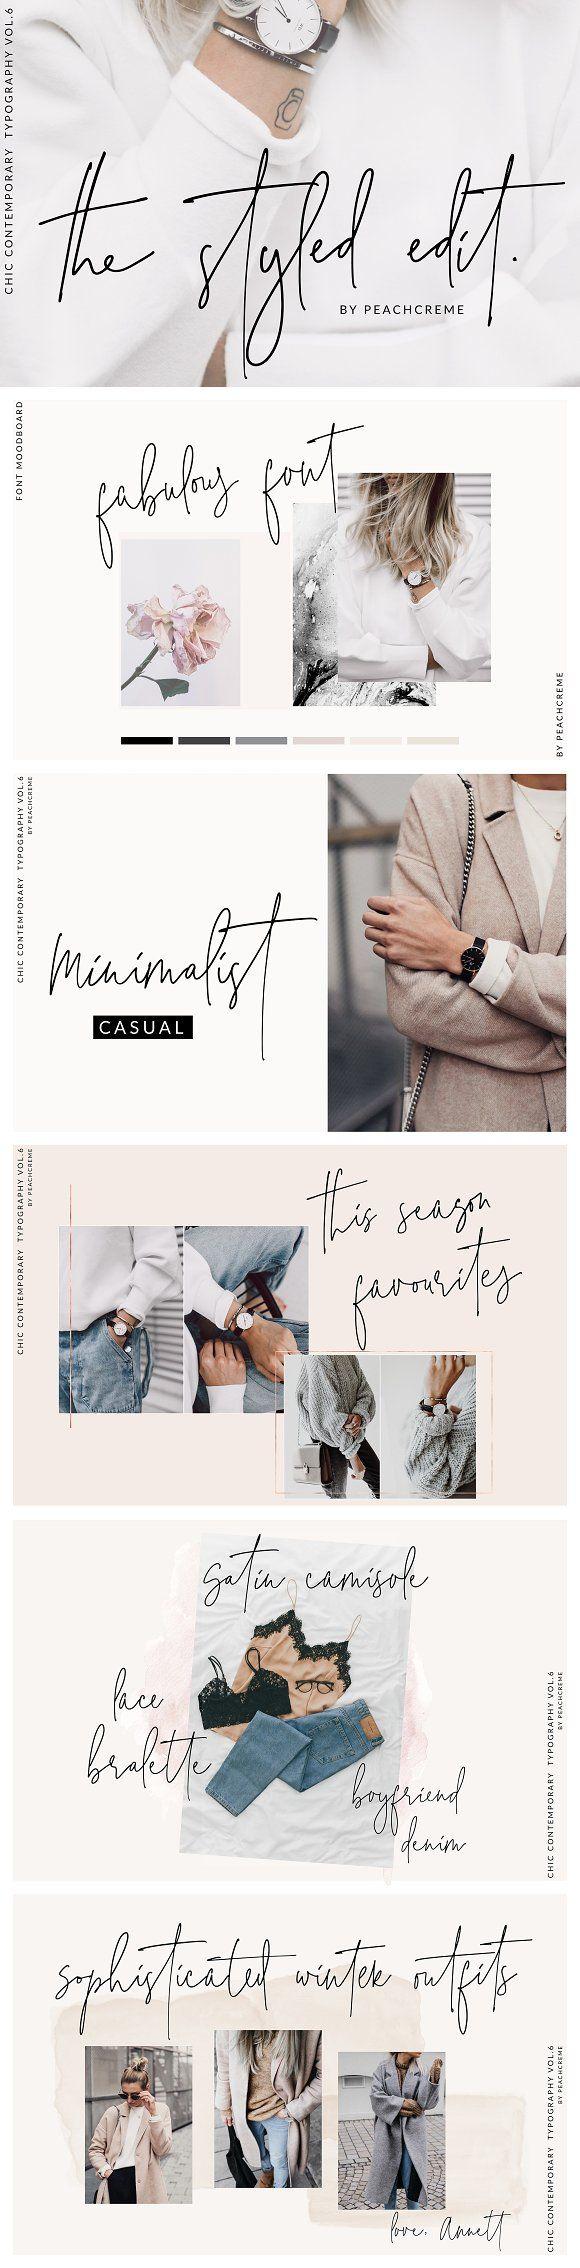 cursive fonts for wedding cards%0A The Styled Edit Chic Script Font is a cr  me de la cr  me font with  contemporary